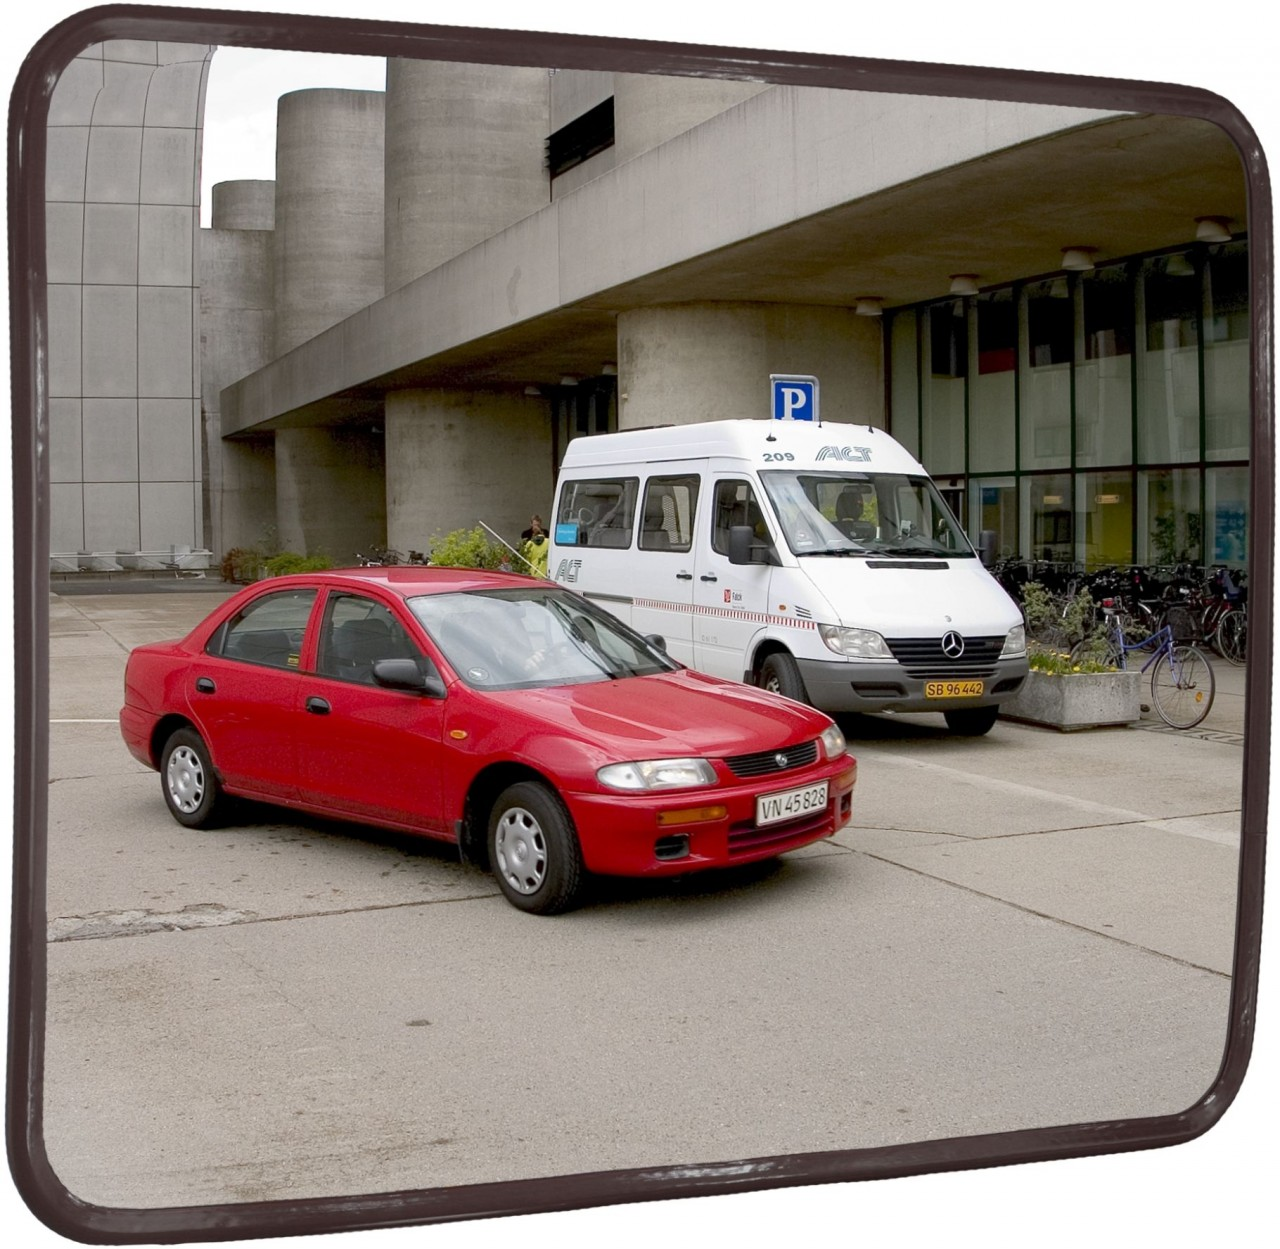 EC-Beobachtungsspiegel, rechteckig, Innenbereich